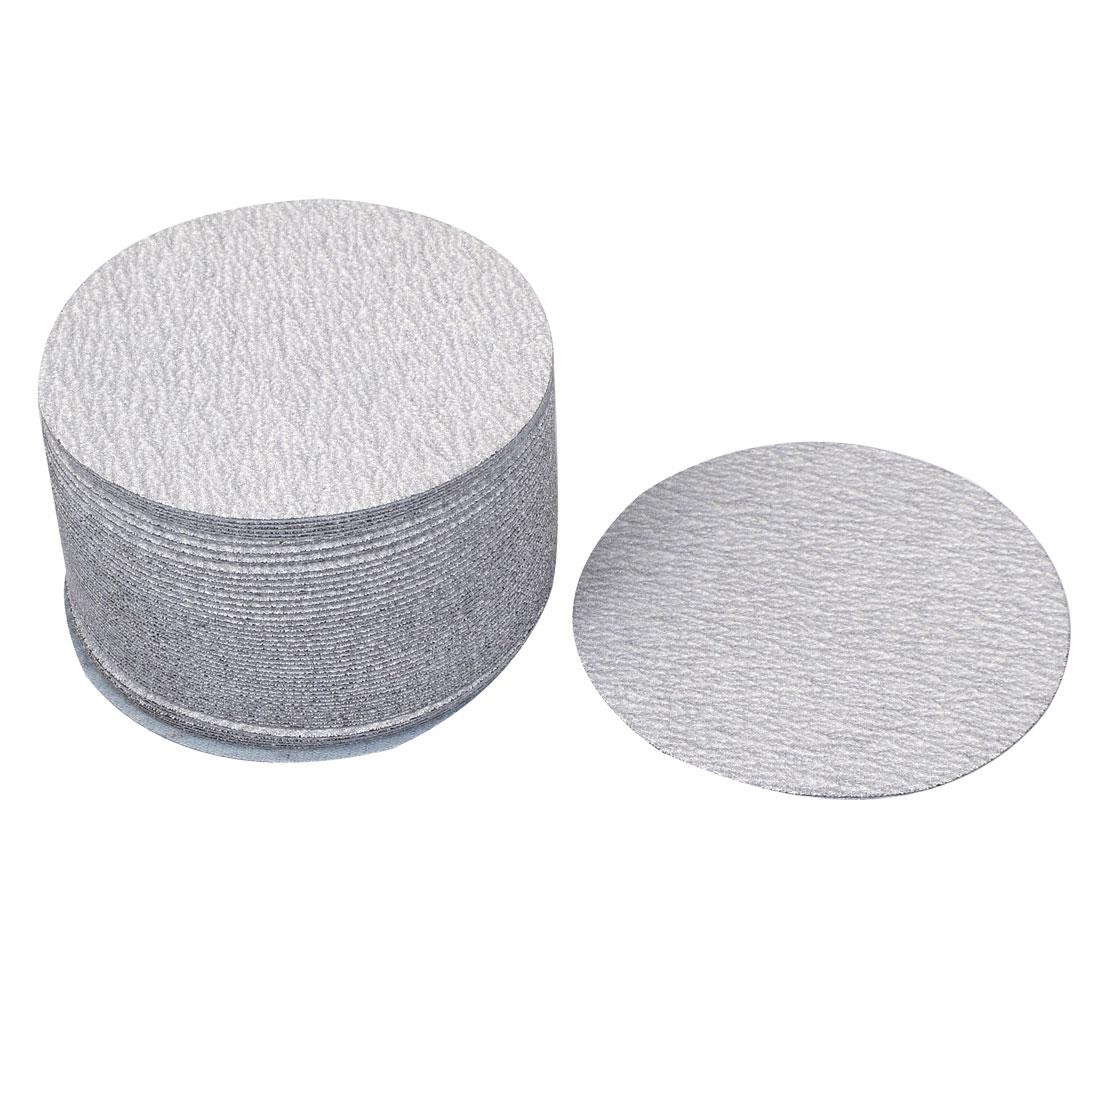 "4"" Dia Polishing Round Dry Abrasive Sanding Sandpaper Sheet Disc 240 Grit 50pcs"